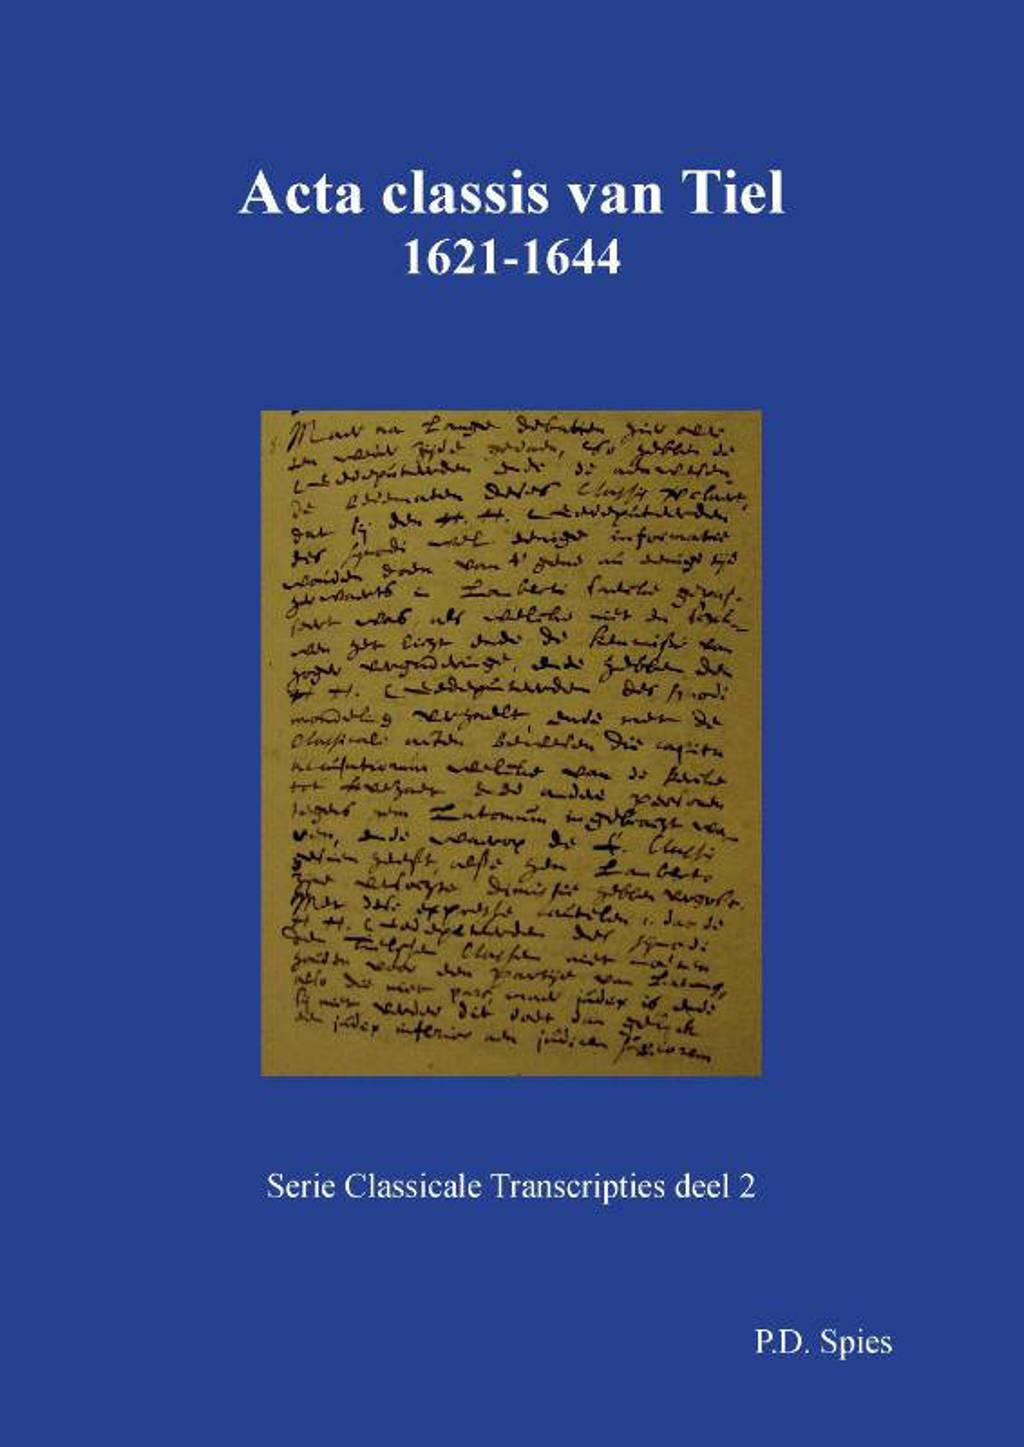 Serie Classicale Transcripties: Acta classis van Tiel 1621-1644 - P.D. Spies